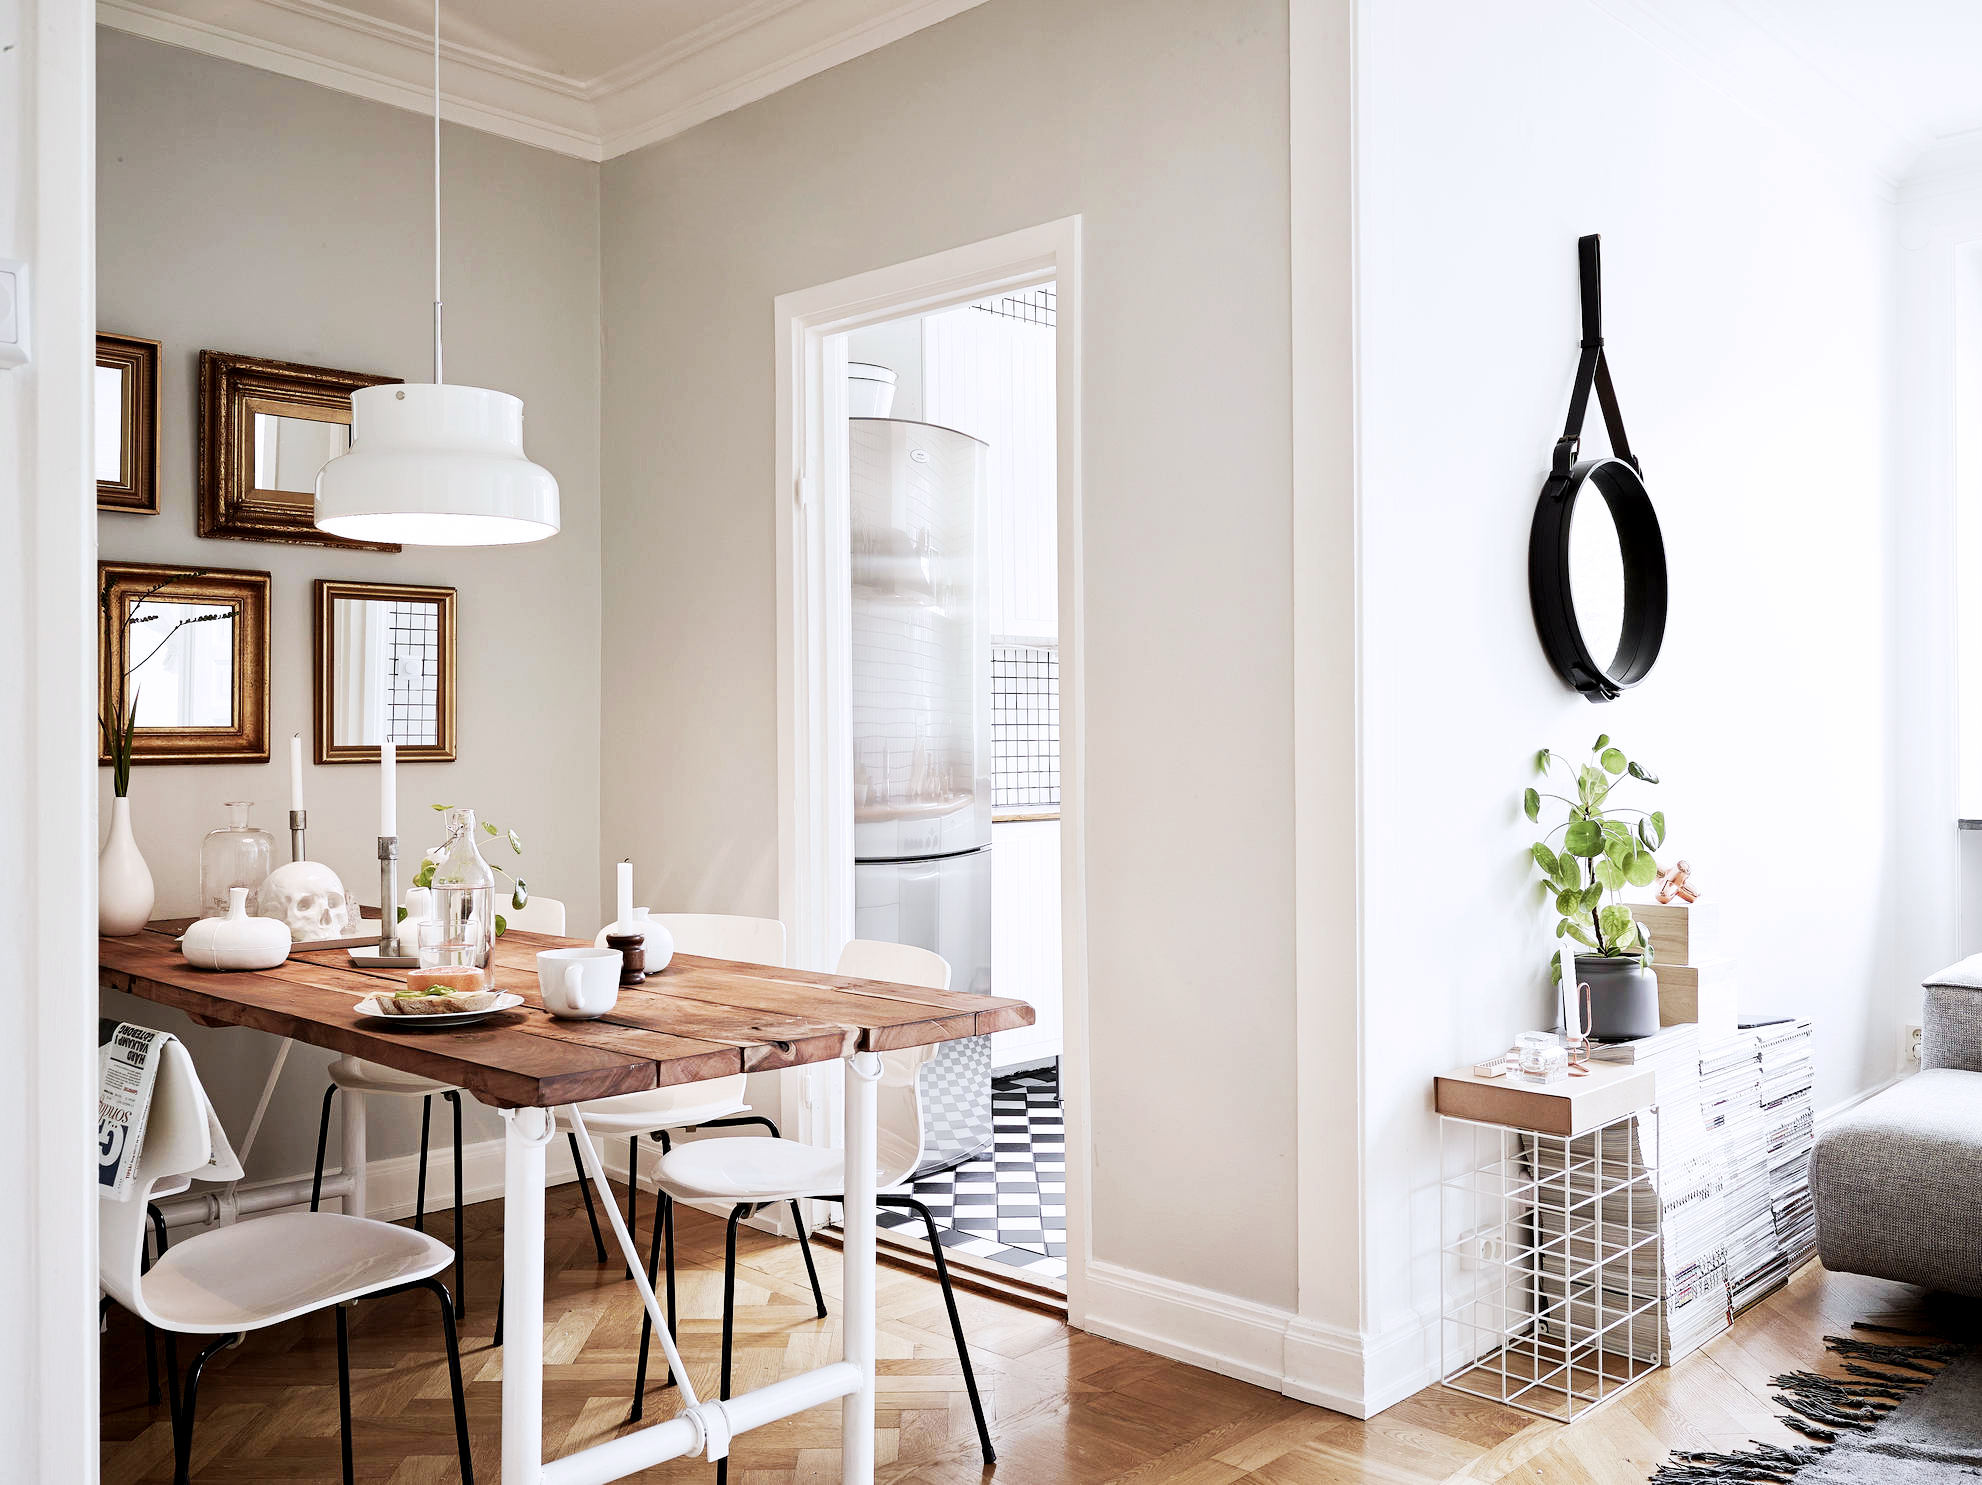 Jelanie blog - Small Scandinavian home 4